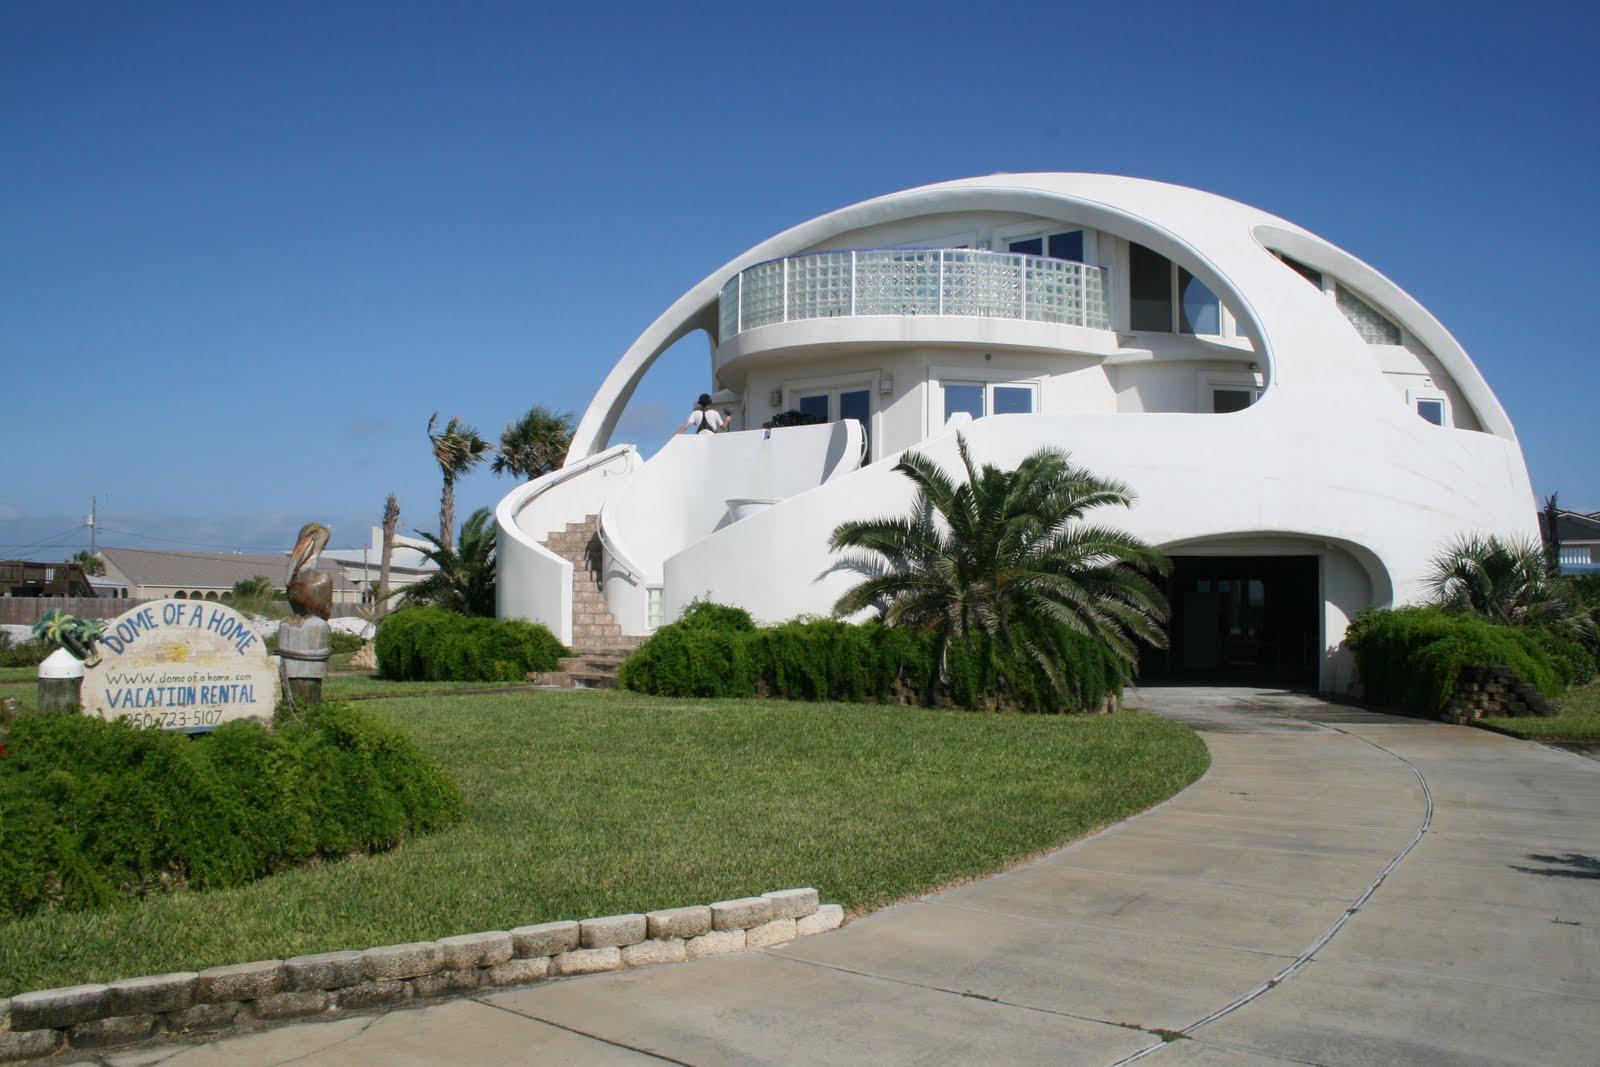 ... Florida Stilt House Plans. on florida hurricane proof house plans